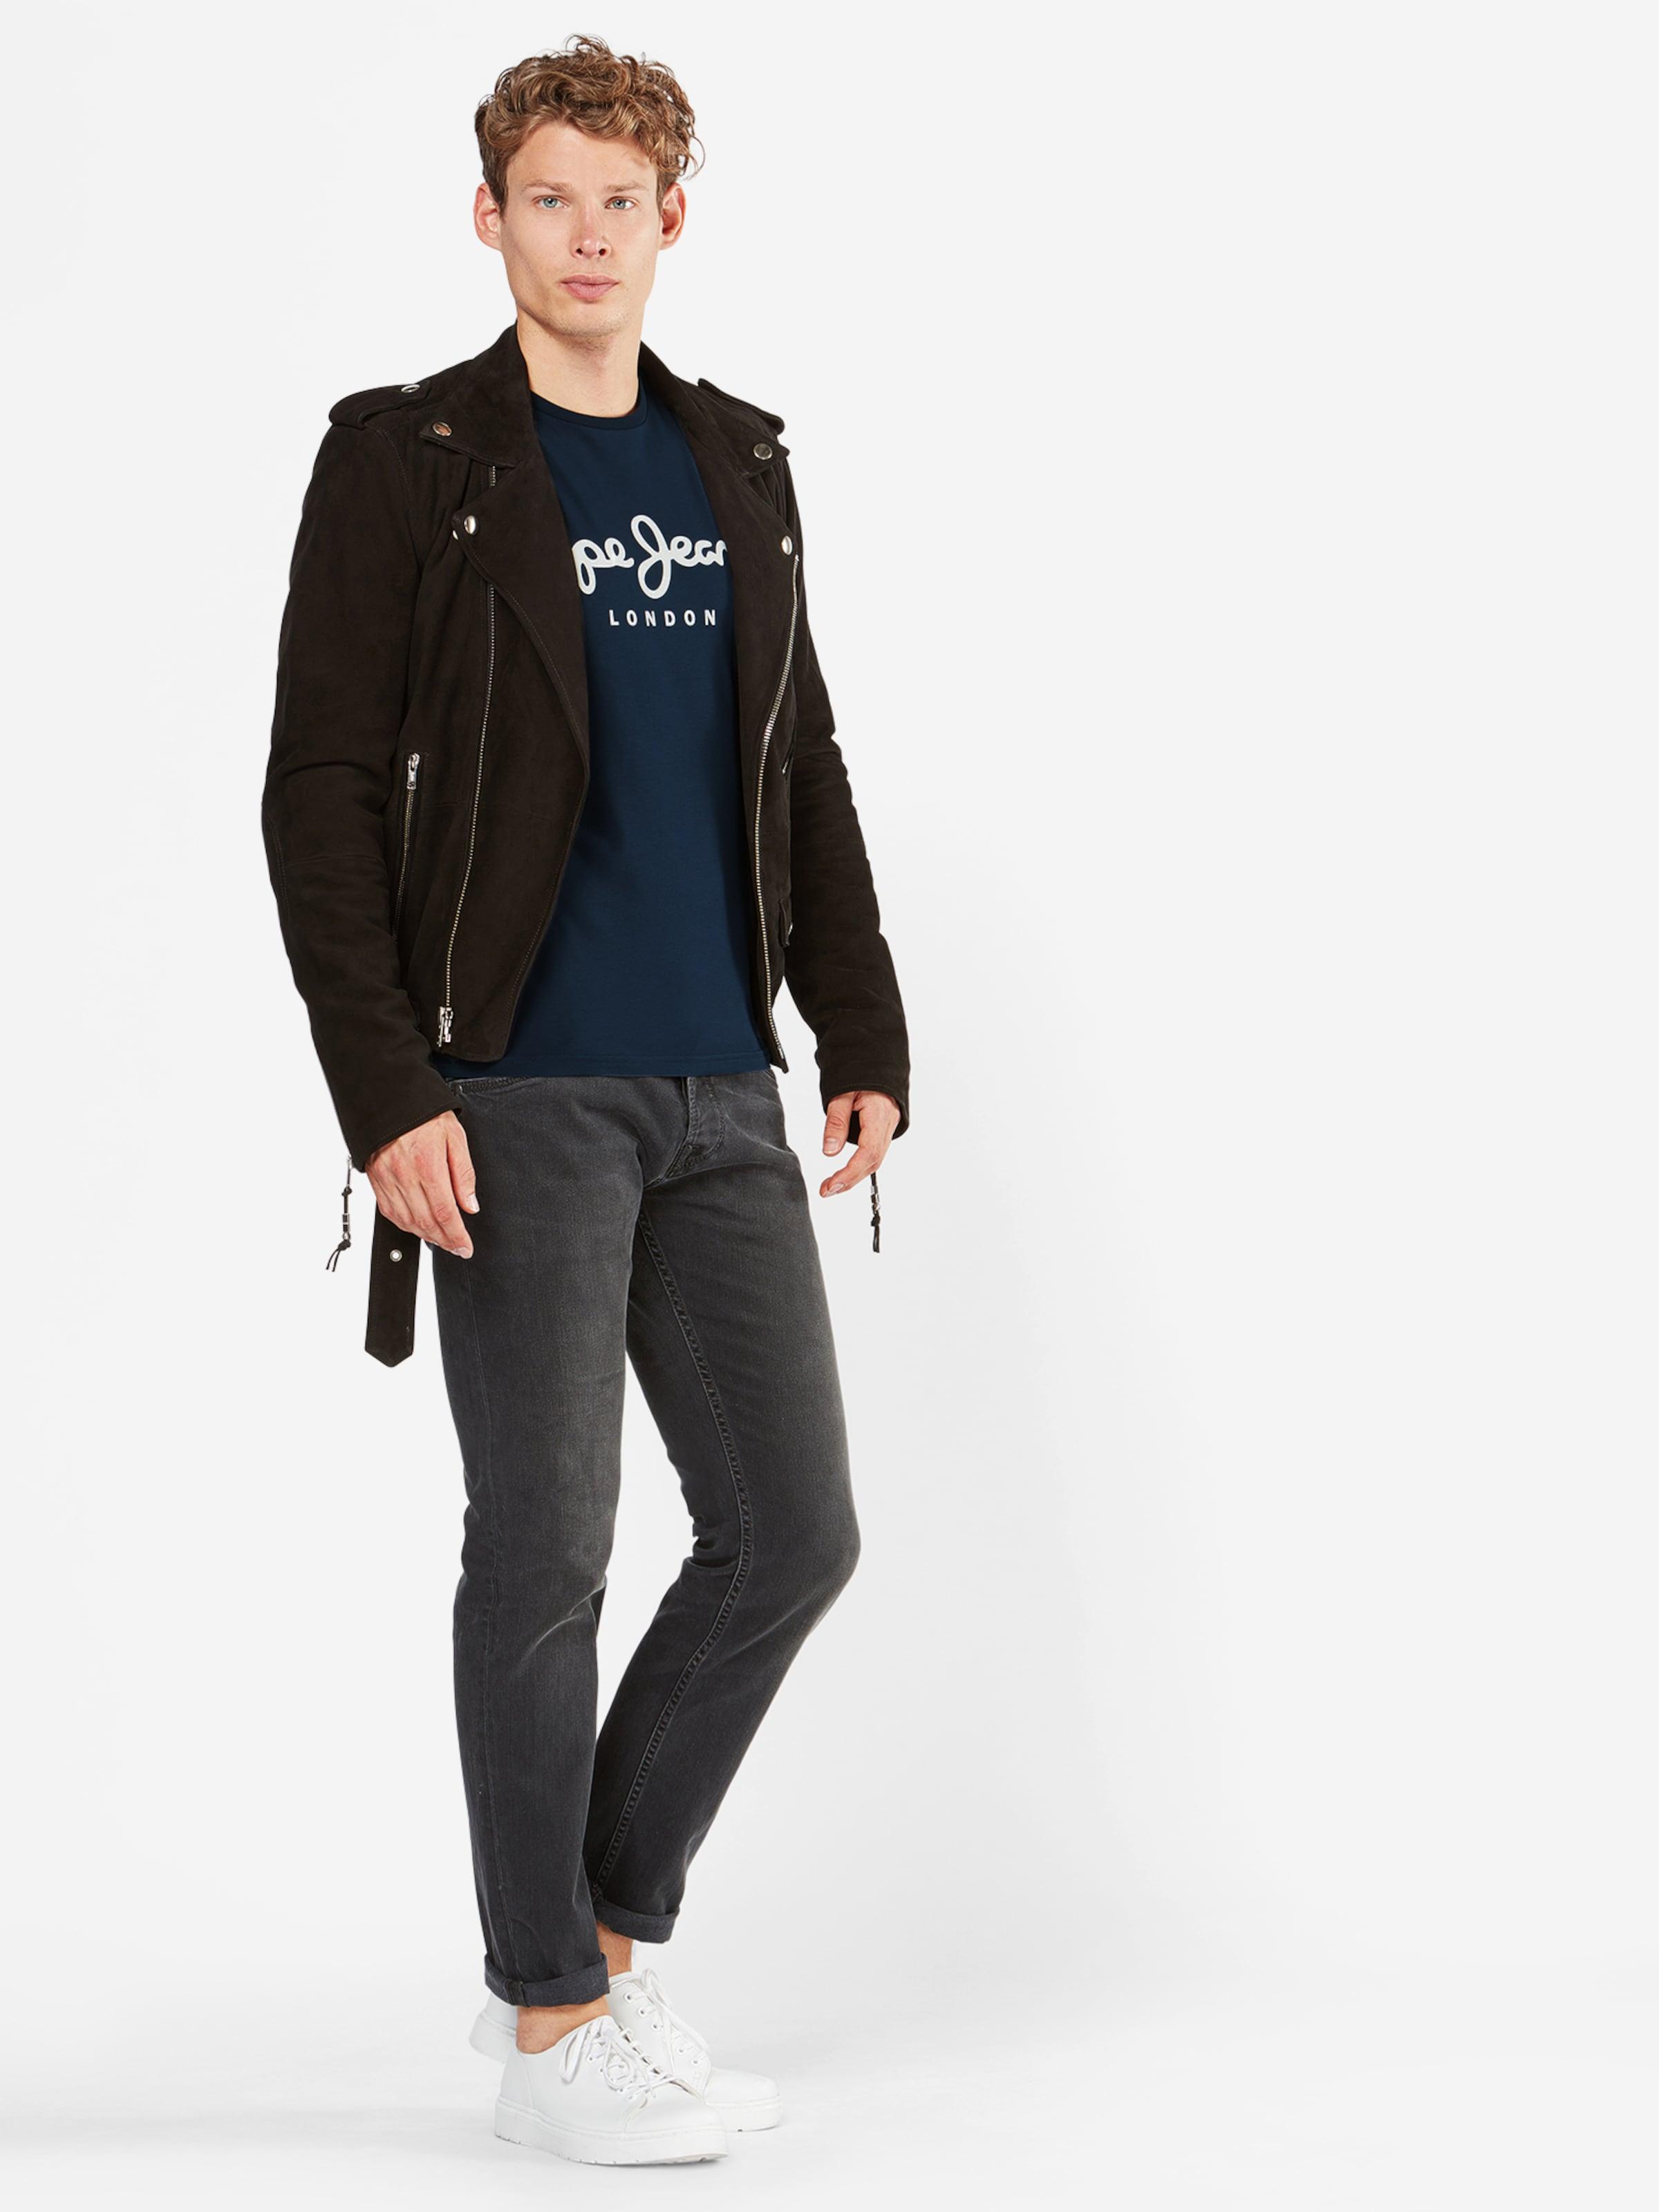 Jeans En Stretch' 'original Pepe T shirt Bleu NuitBlanc QhCtdxsr